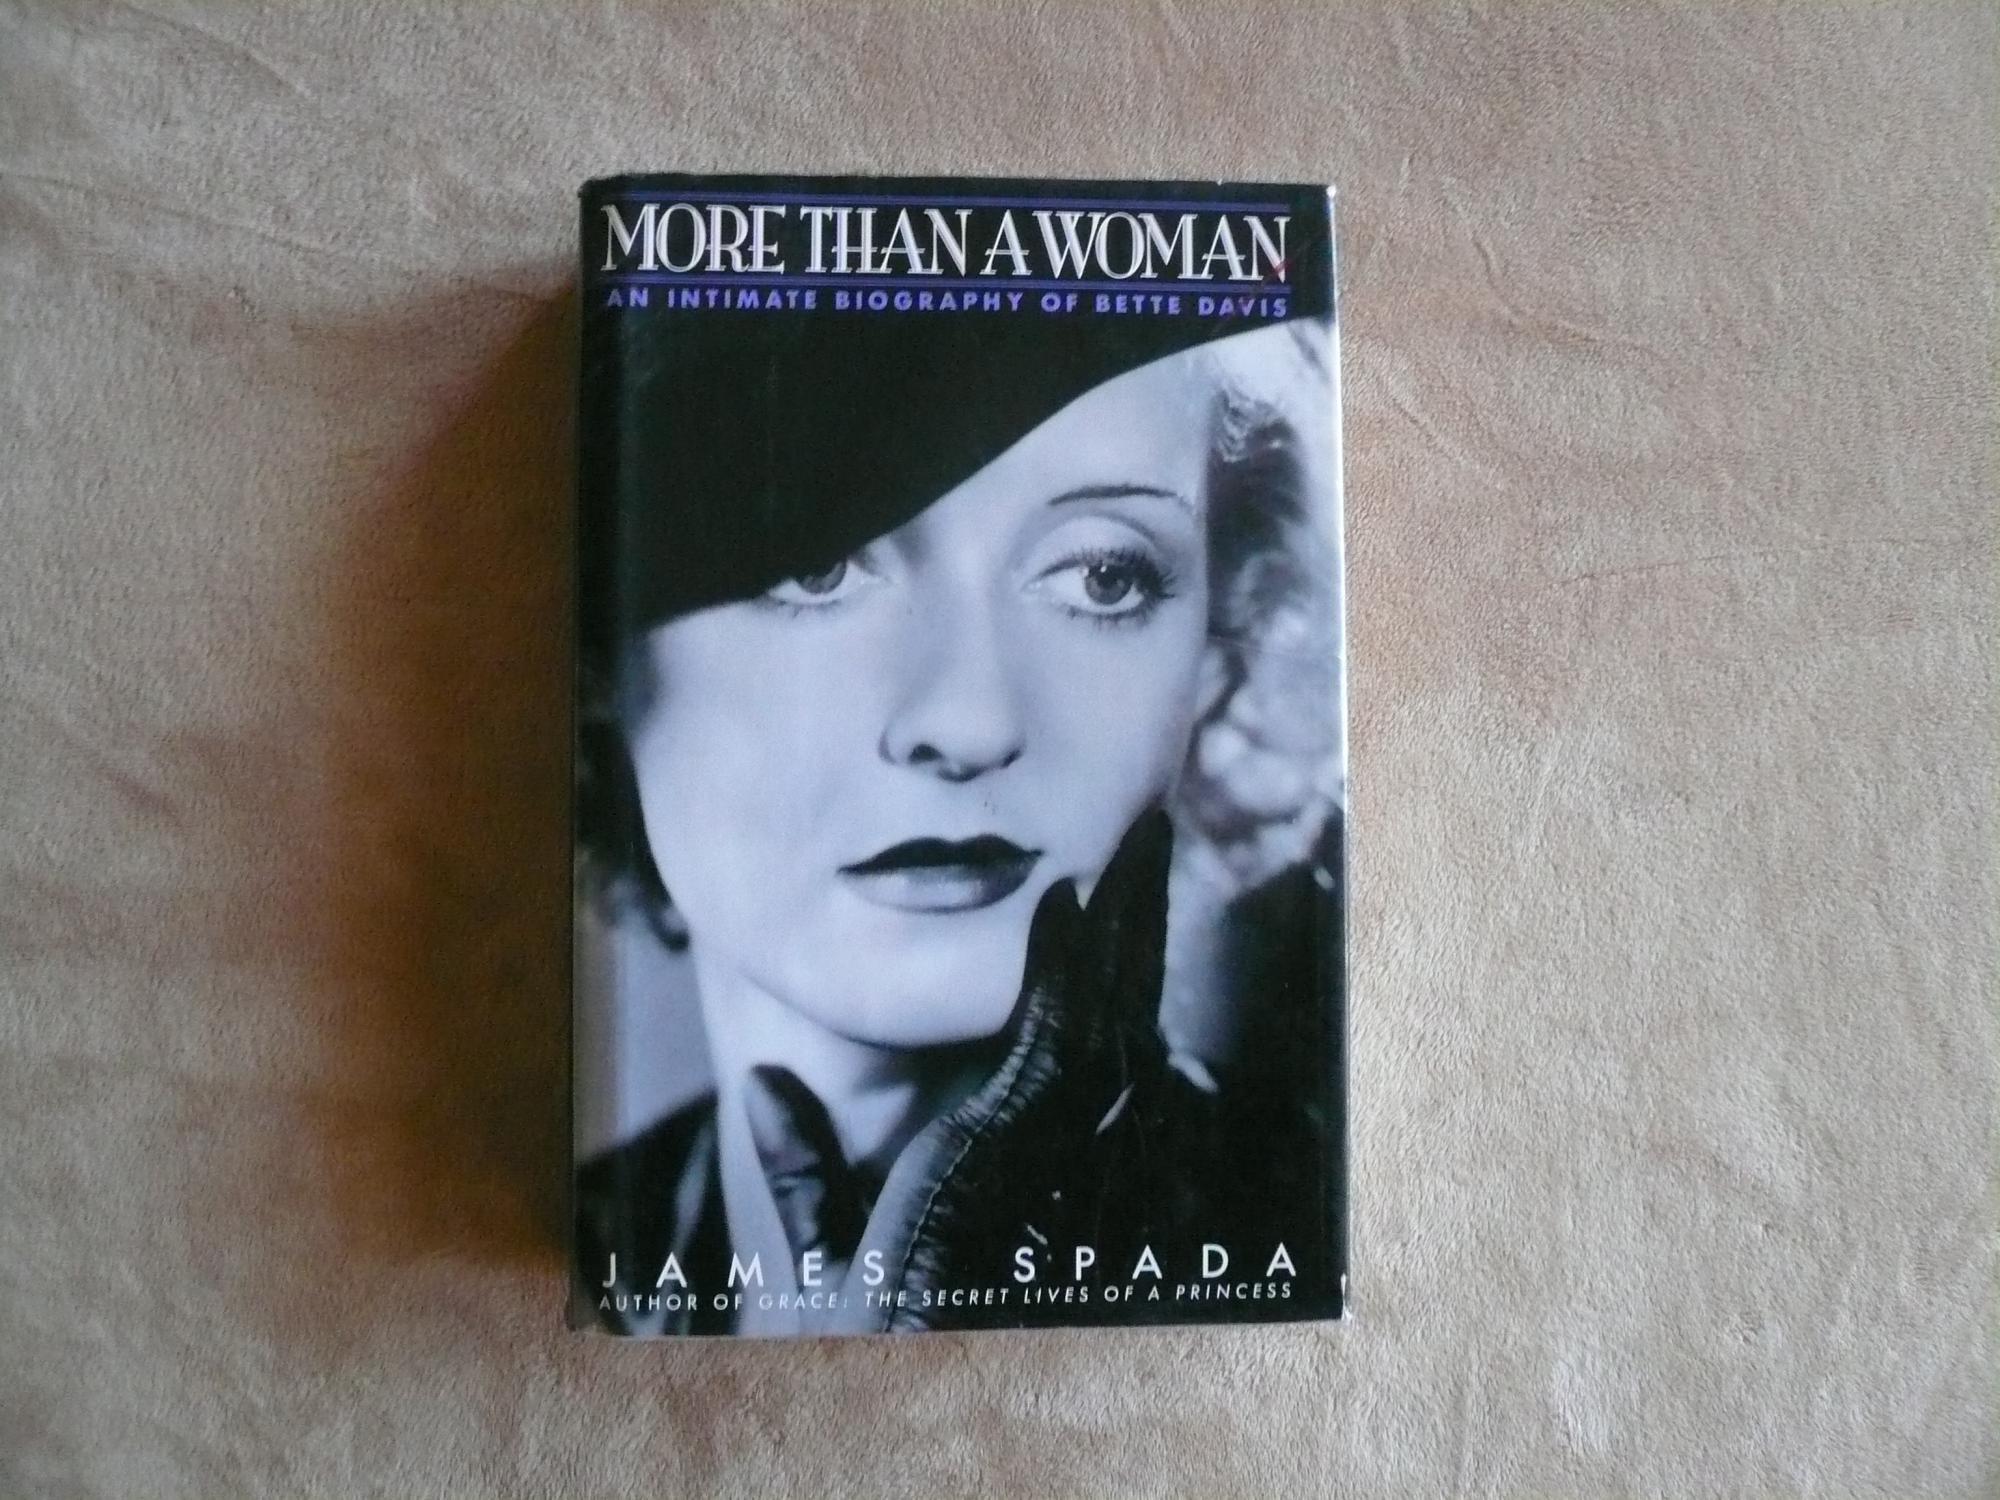 More Than A Woman An Intimate Biography Of Bette Davis Spada James 9780553095128 Amazon Com Books,Wall Stickers For Bedroom Flipkart